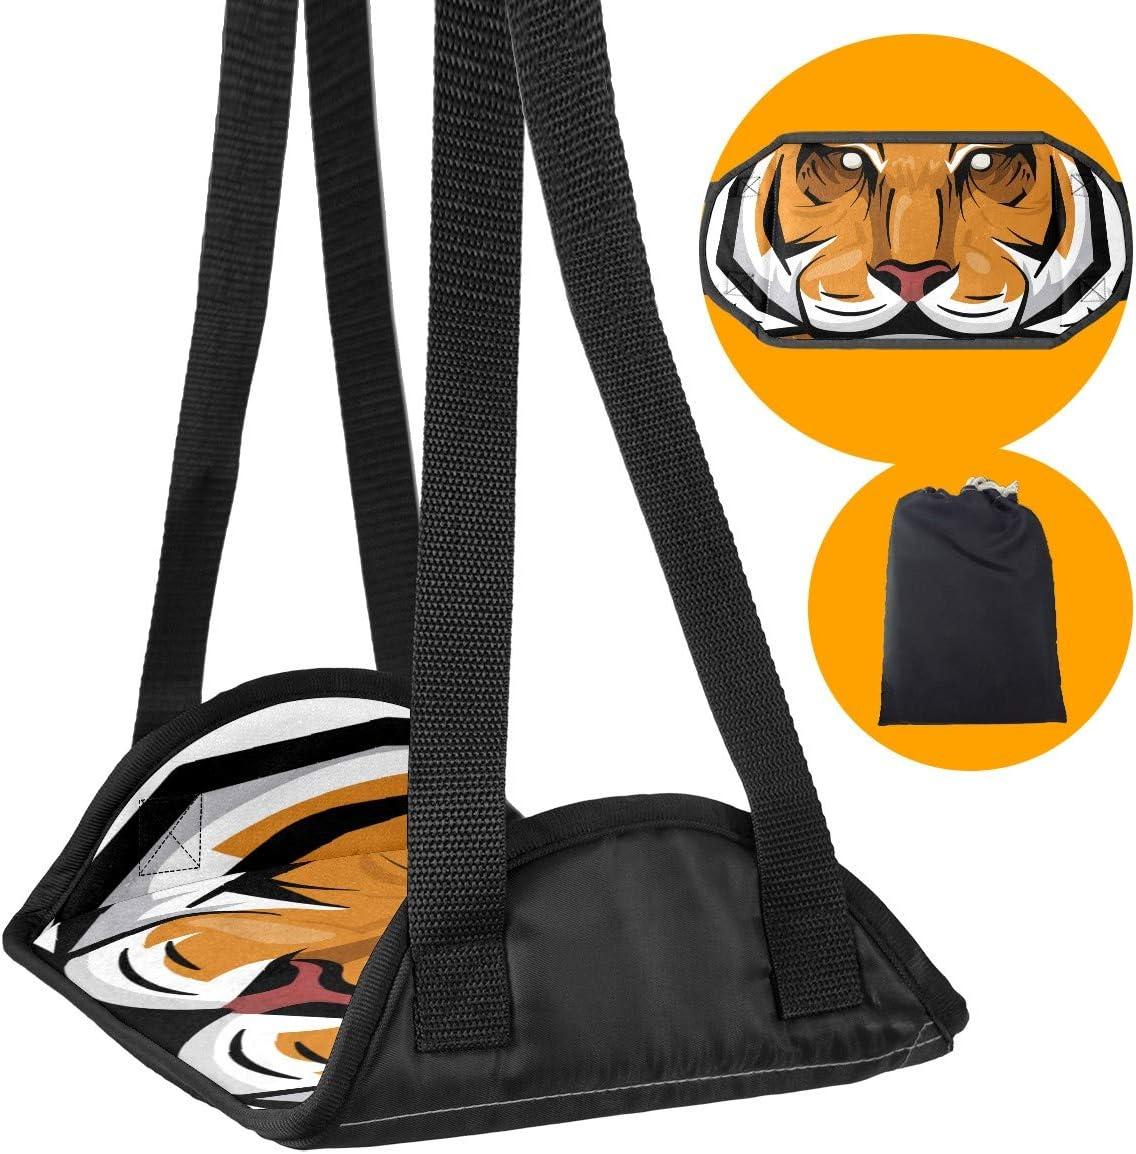 Foot Hammock Desk Footrest Comfy Hanger Portable Mesa Mall Adjustable